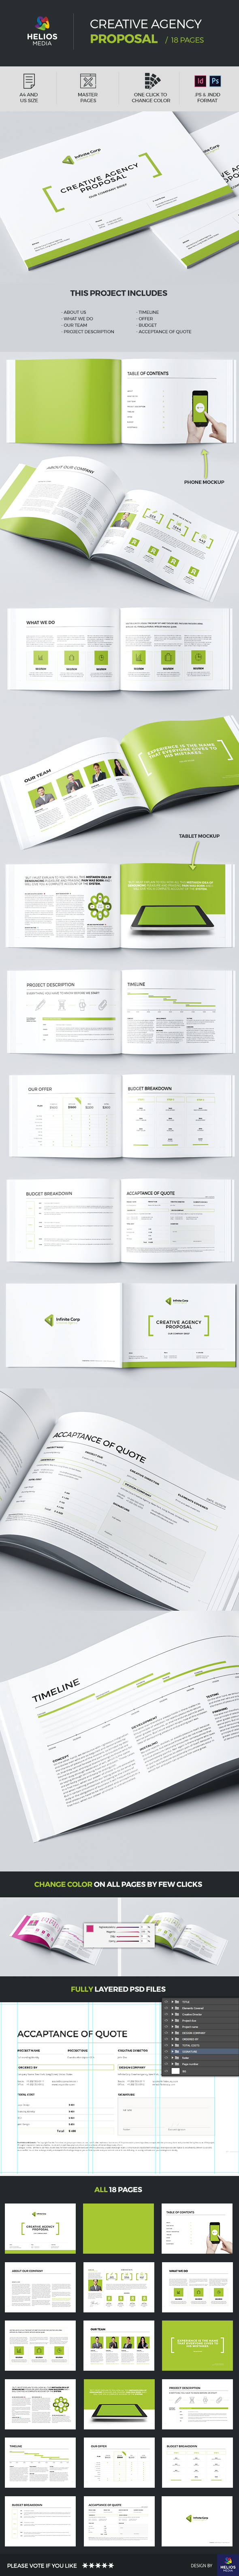 agency brand brochure clean creative horizontal identity InDesign invoice logo manual minimal modern offer print